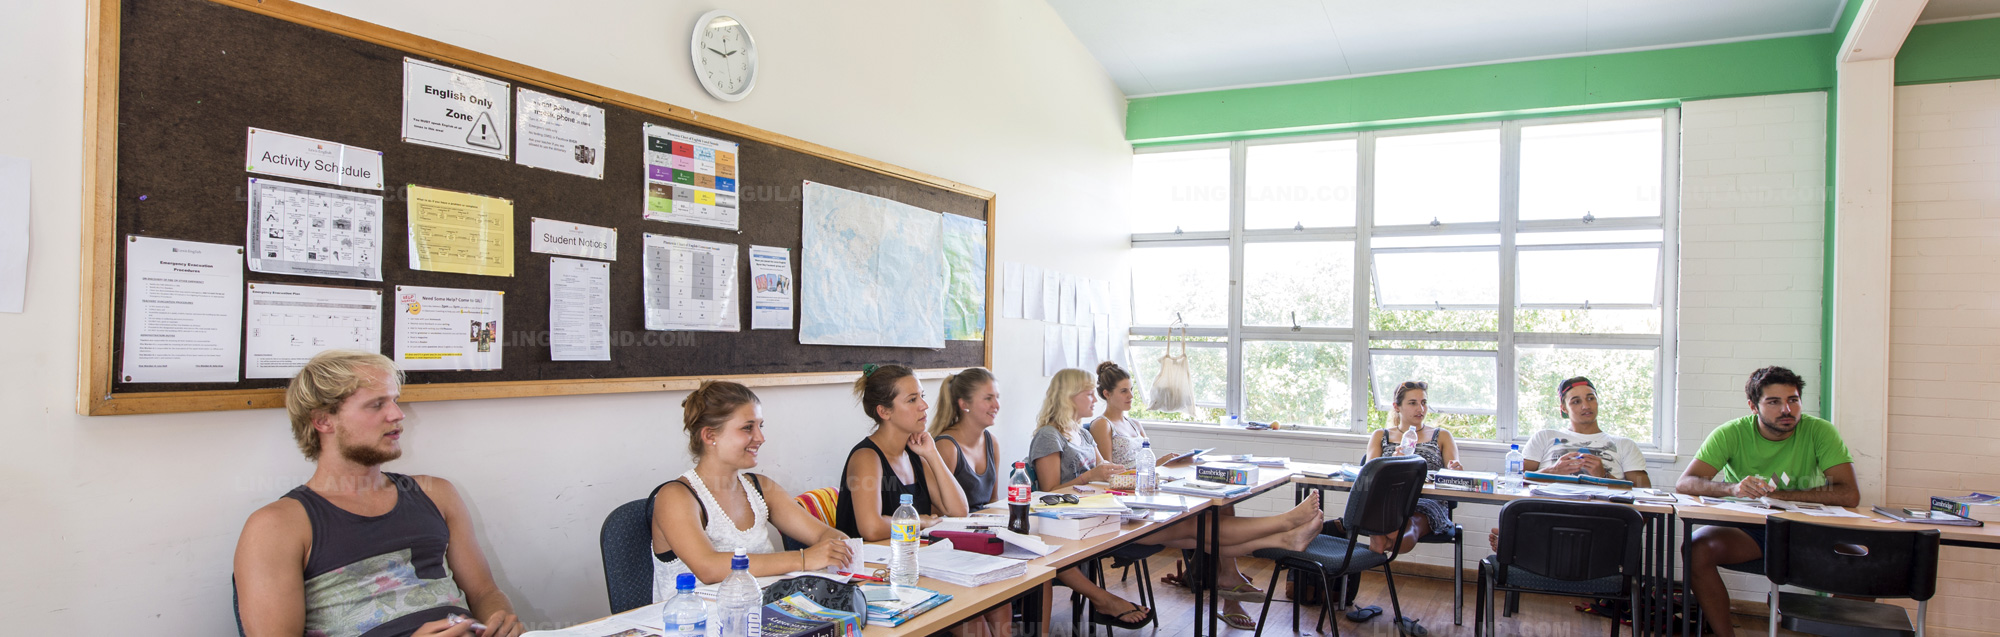 Escuela de inglés Lexis Byron Bay